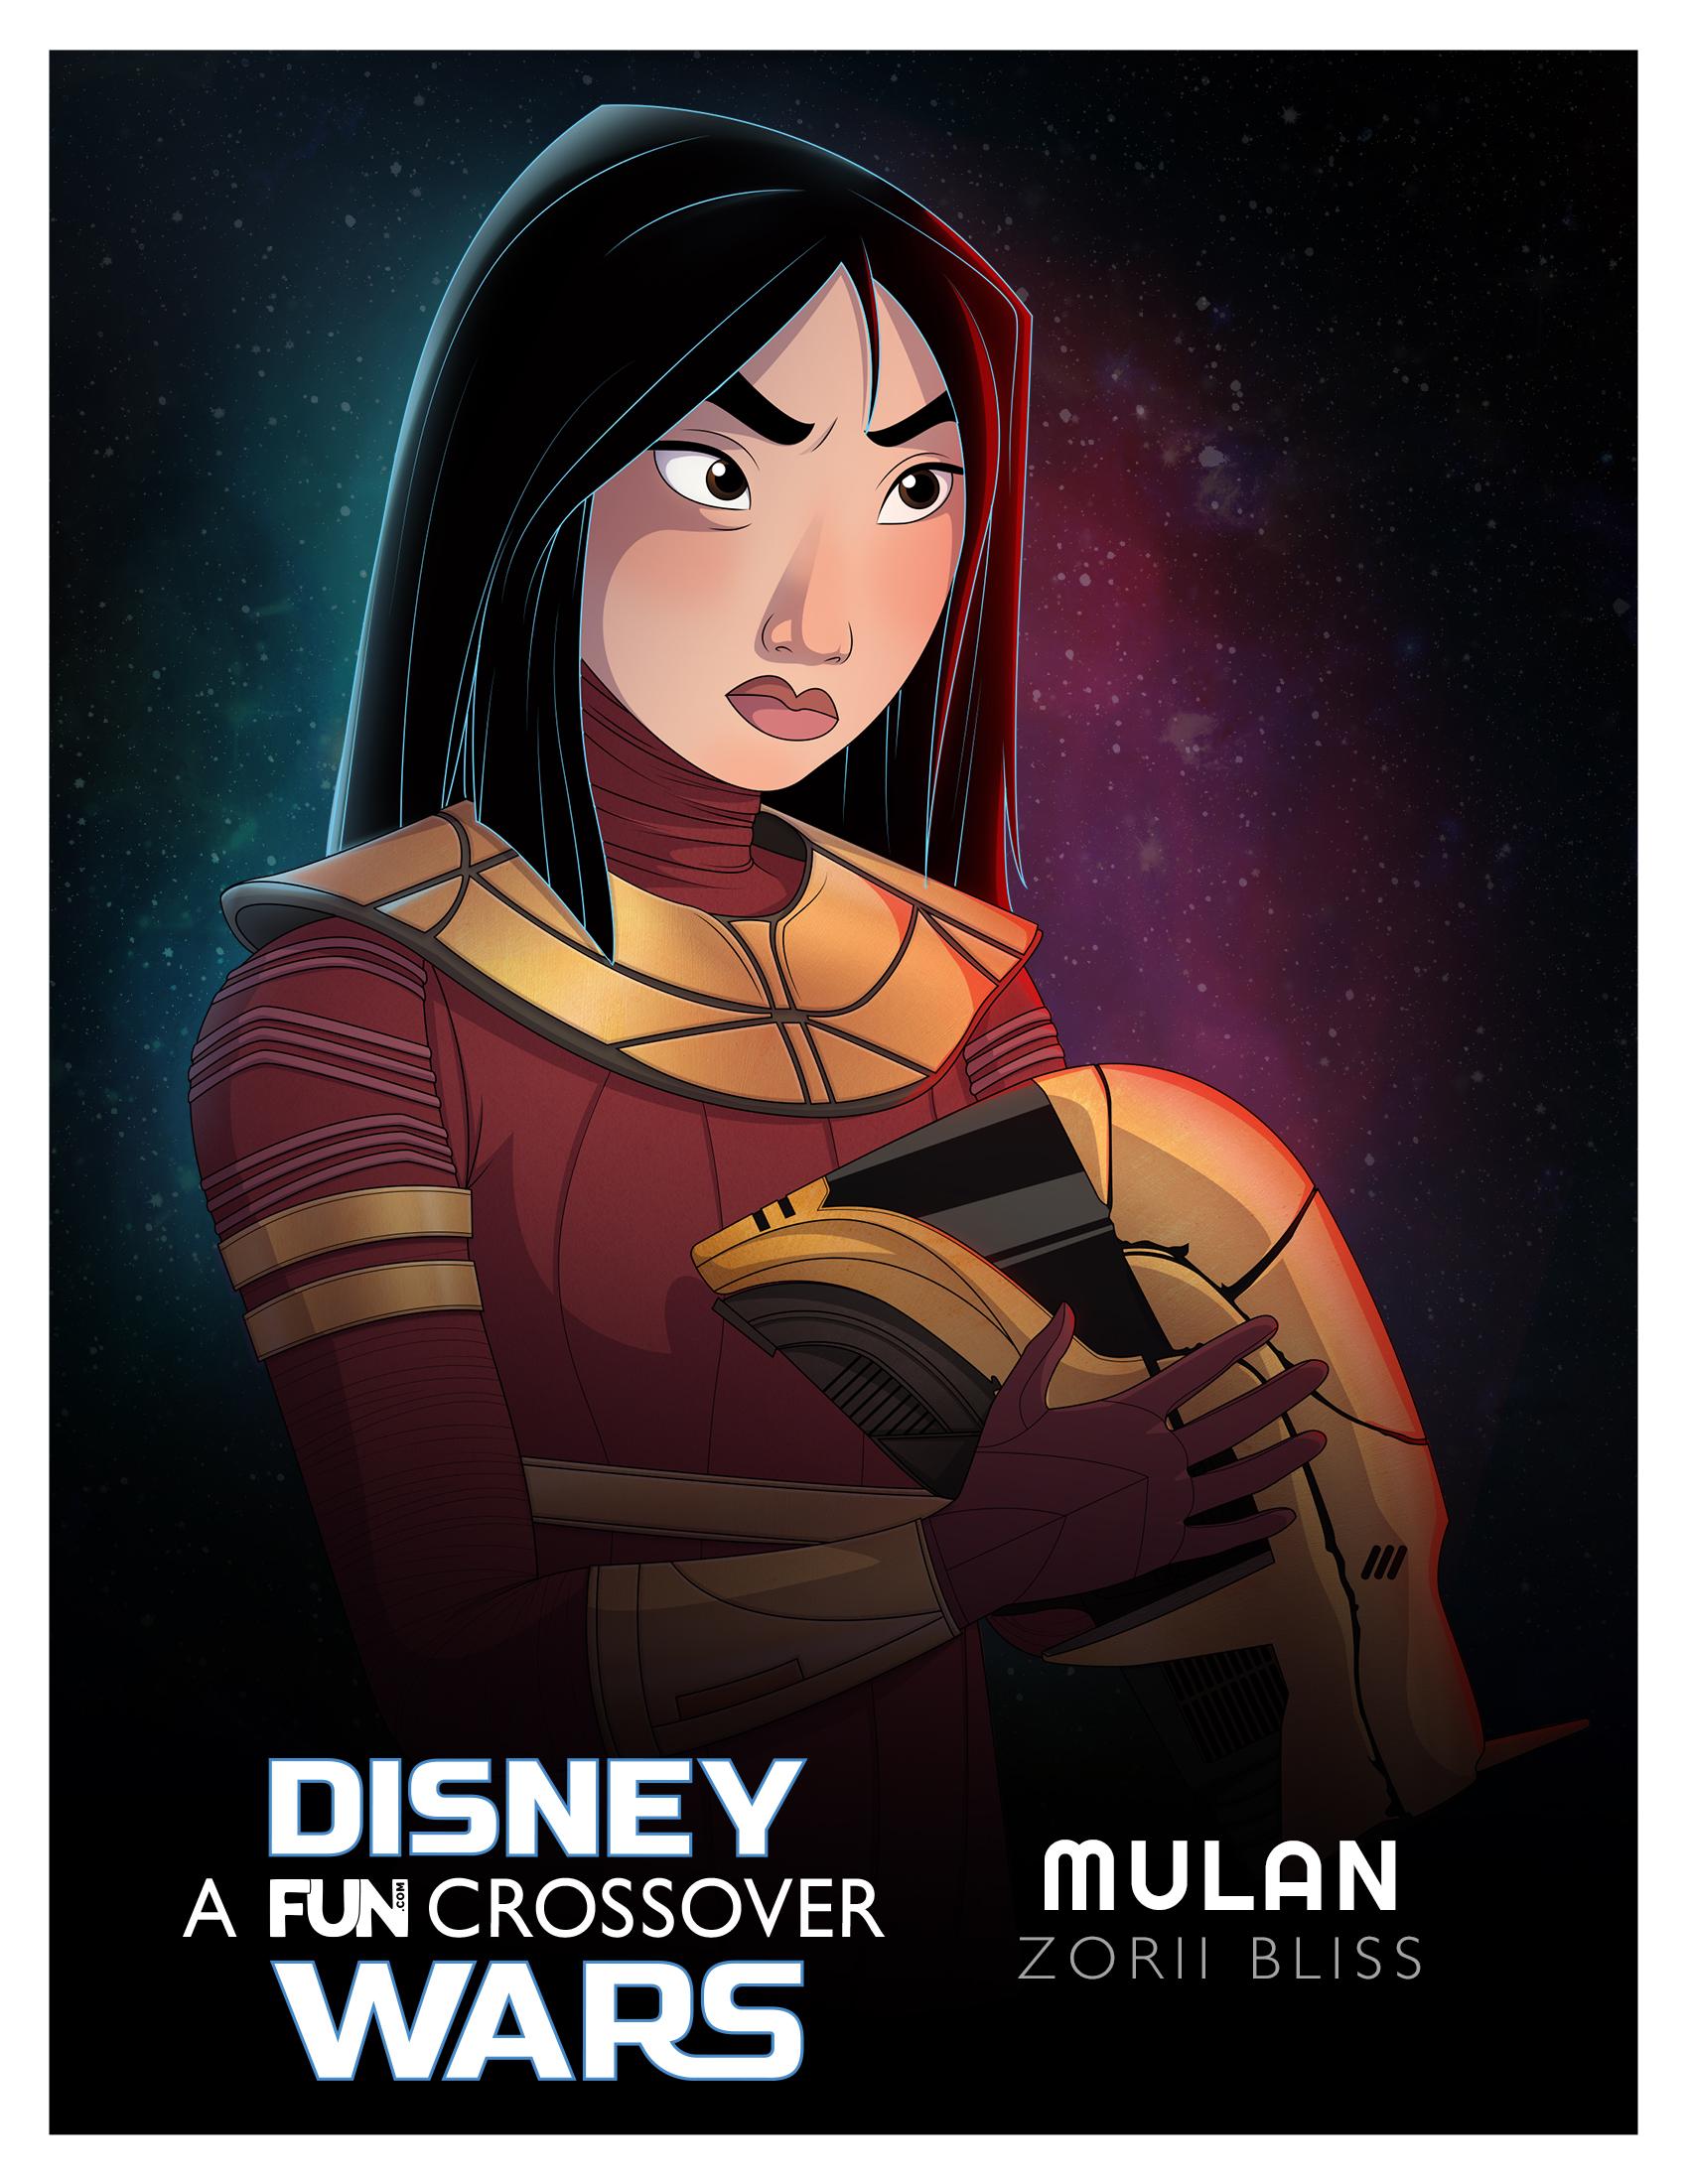 Disney Wars Mulan Zorii Bliss